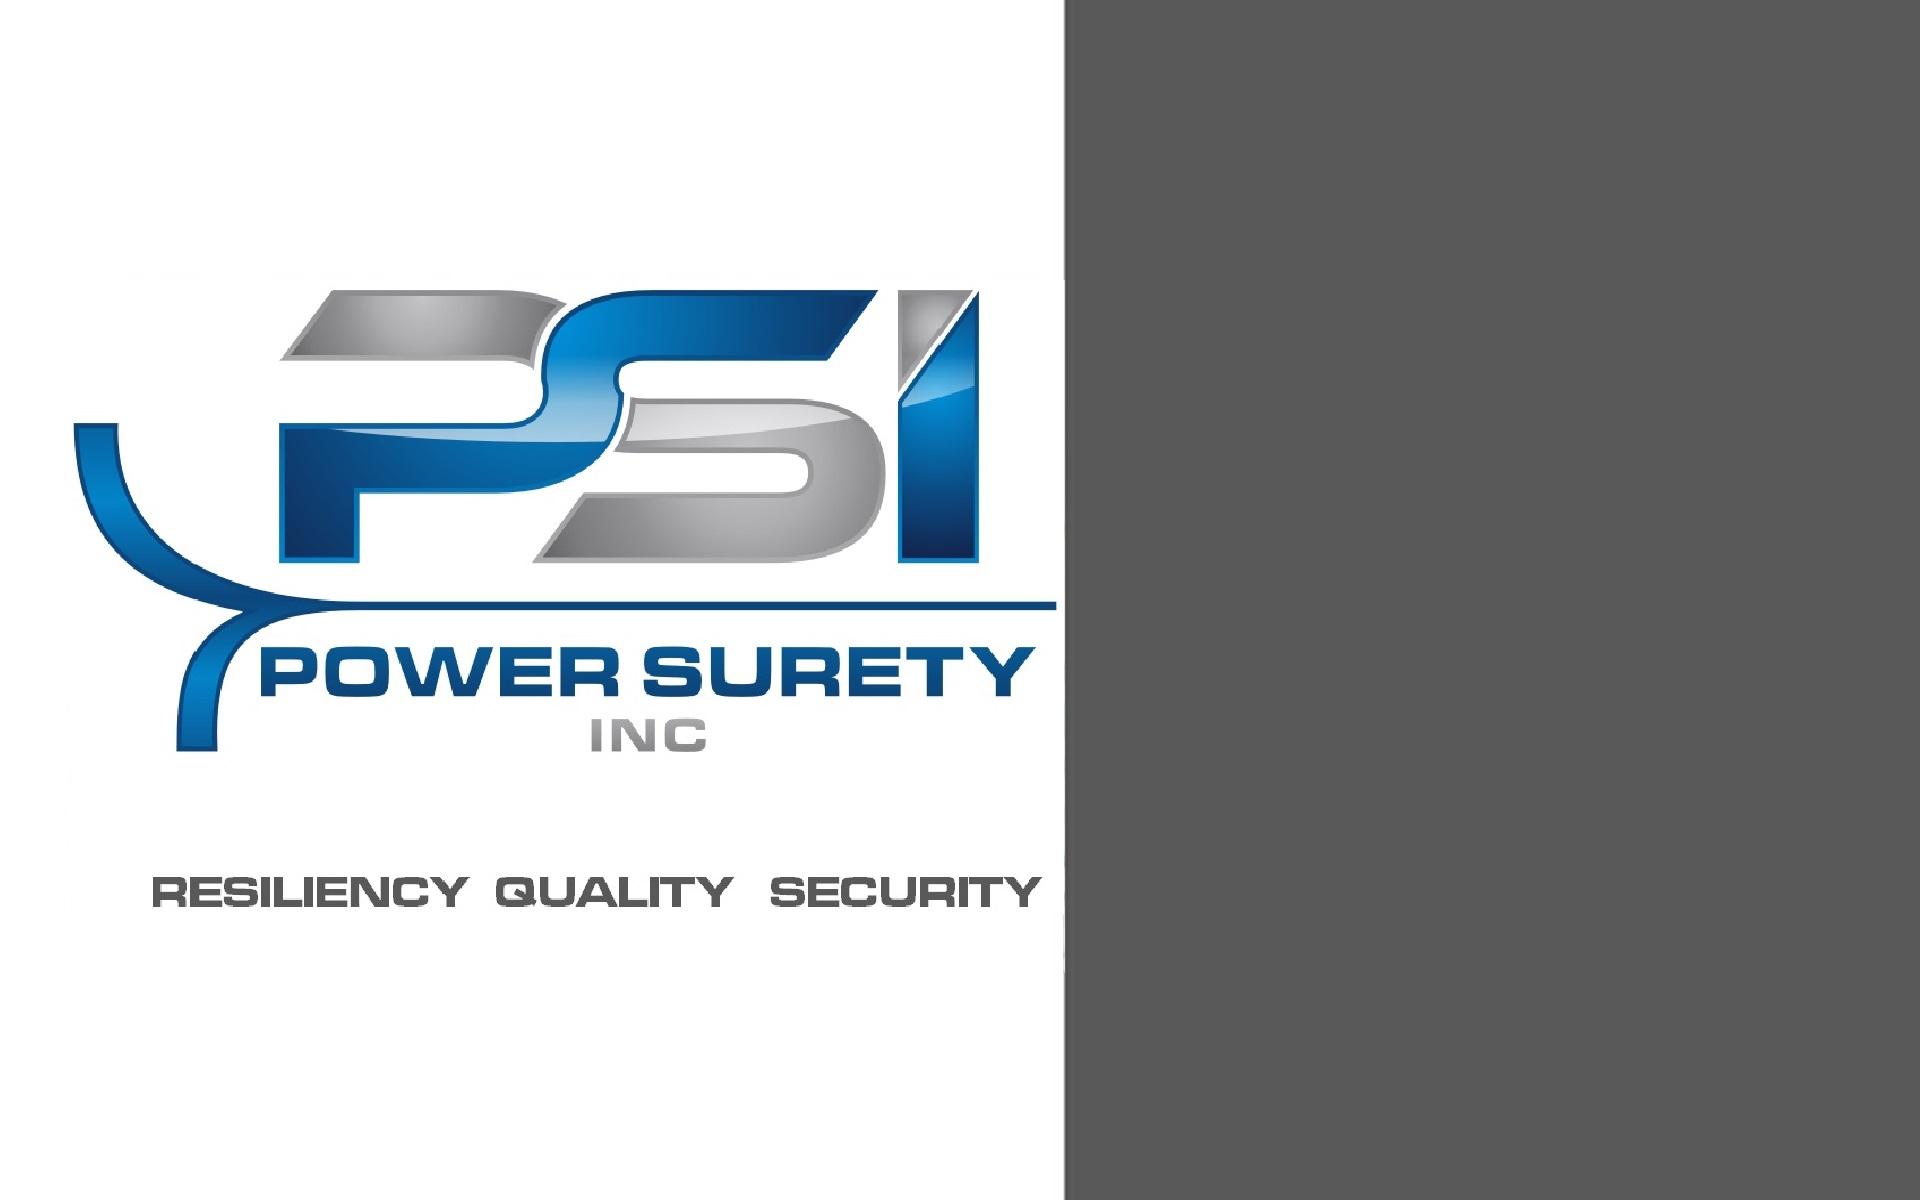 PowerSurety leadership security quality resiliency